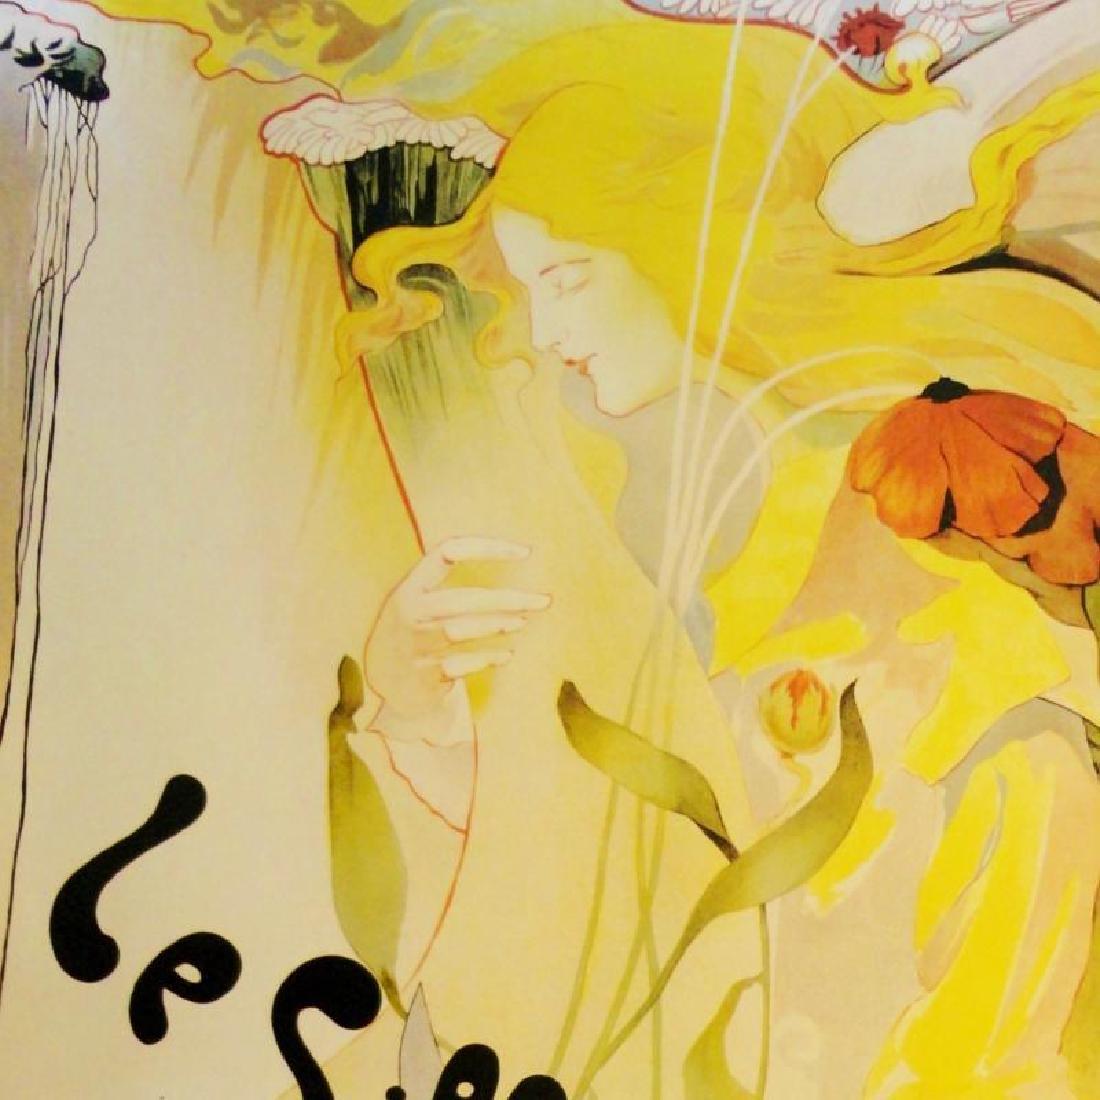 Antique Poster Reproduction Colorful Art Large Print - 2